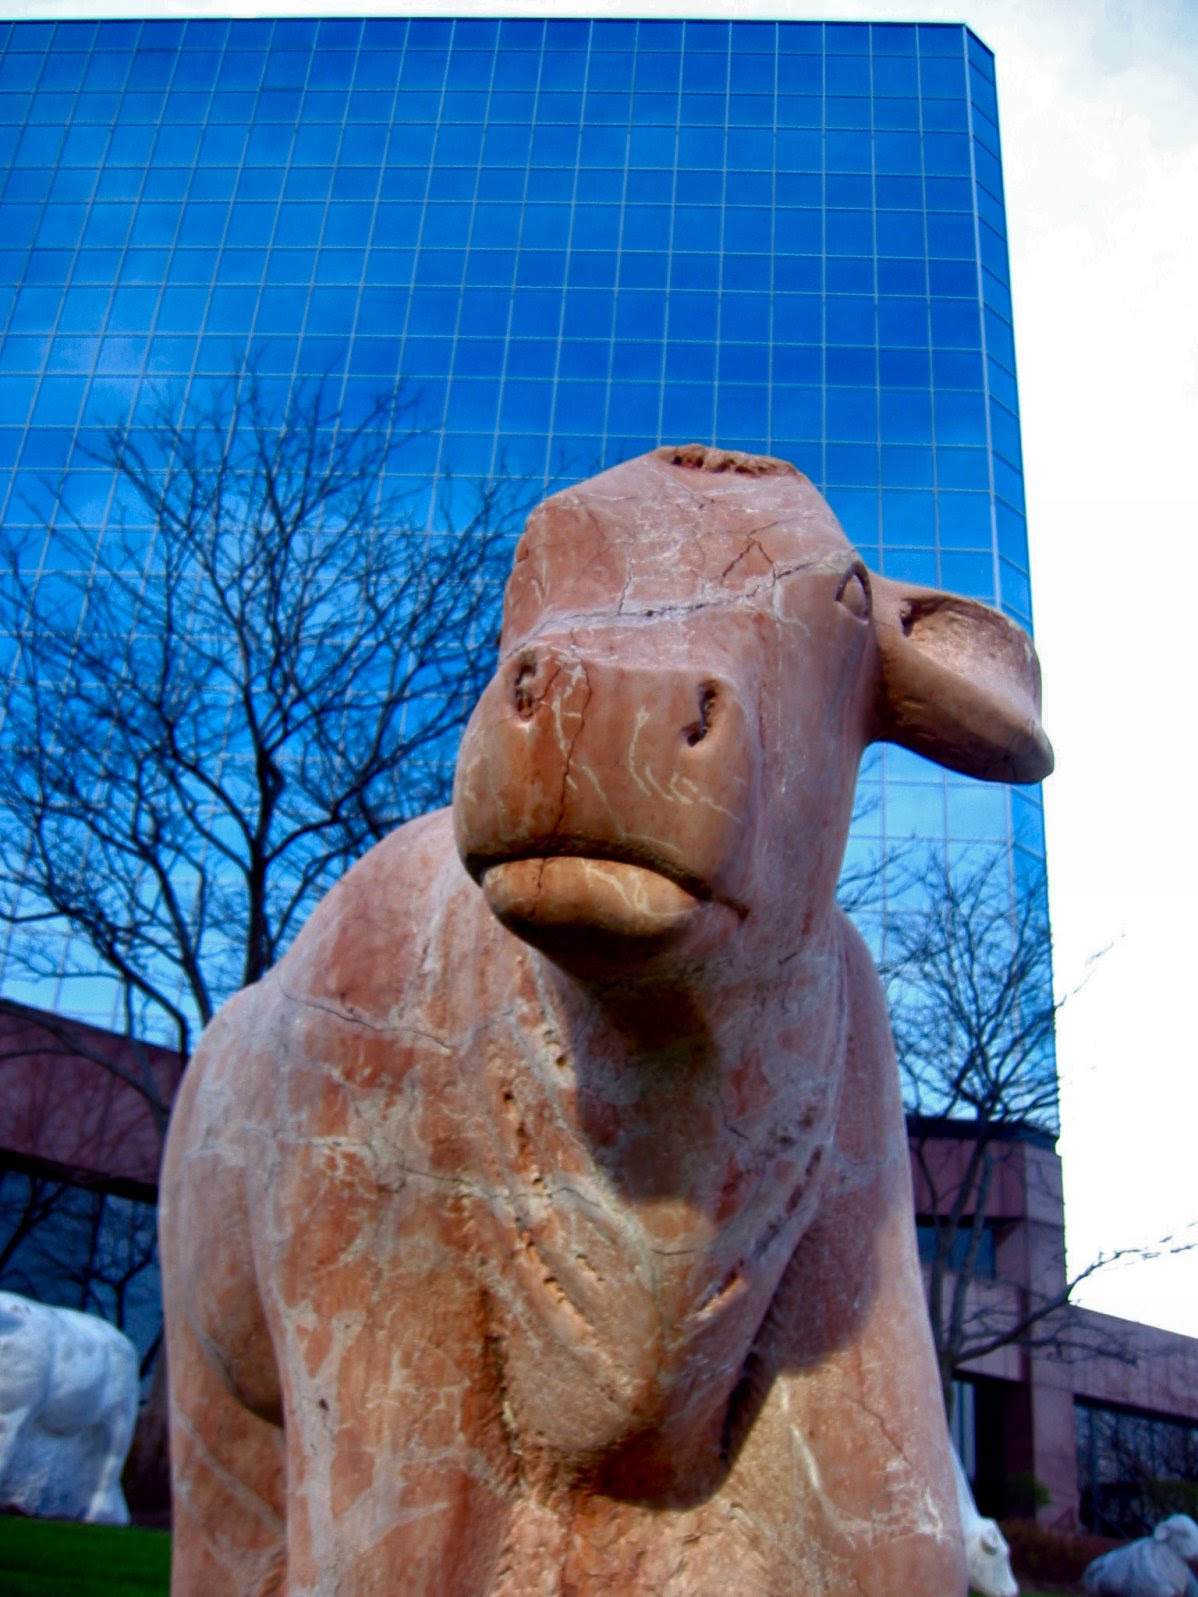 soul-amp cow statue pics